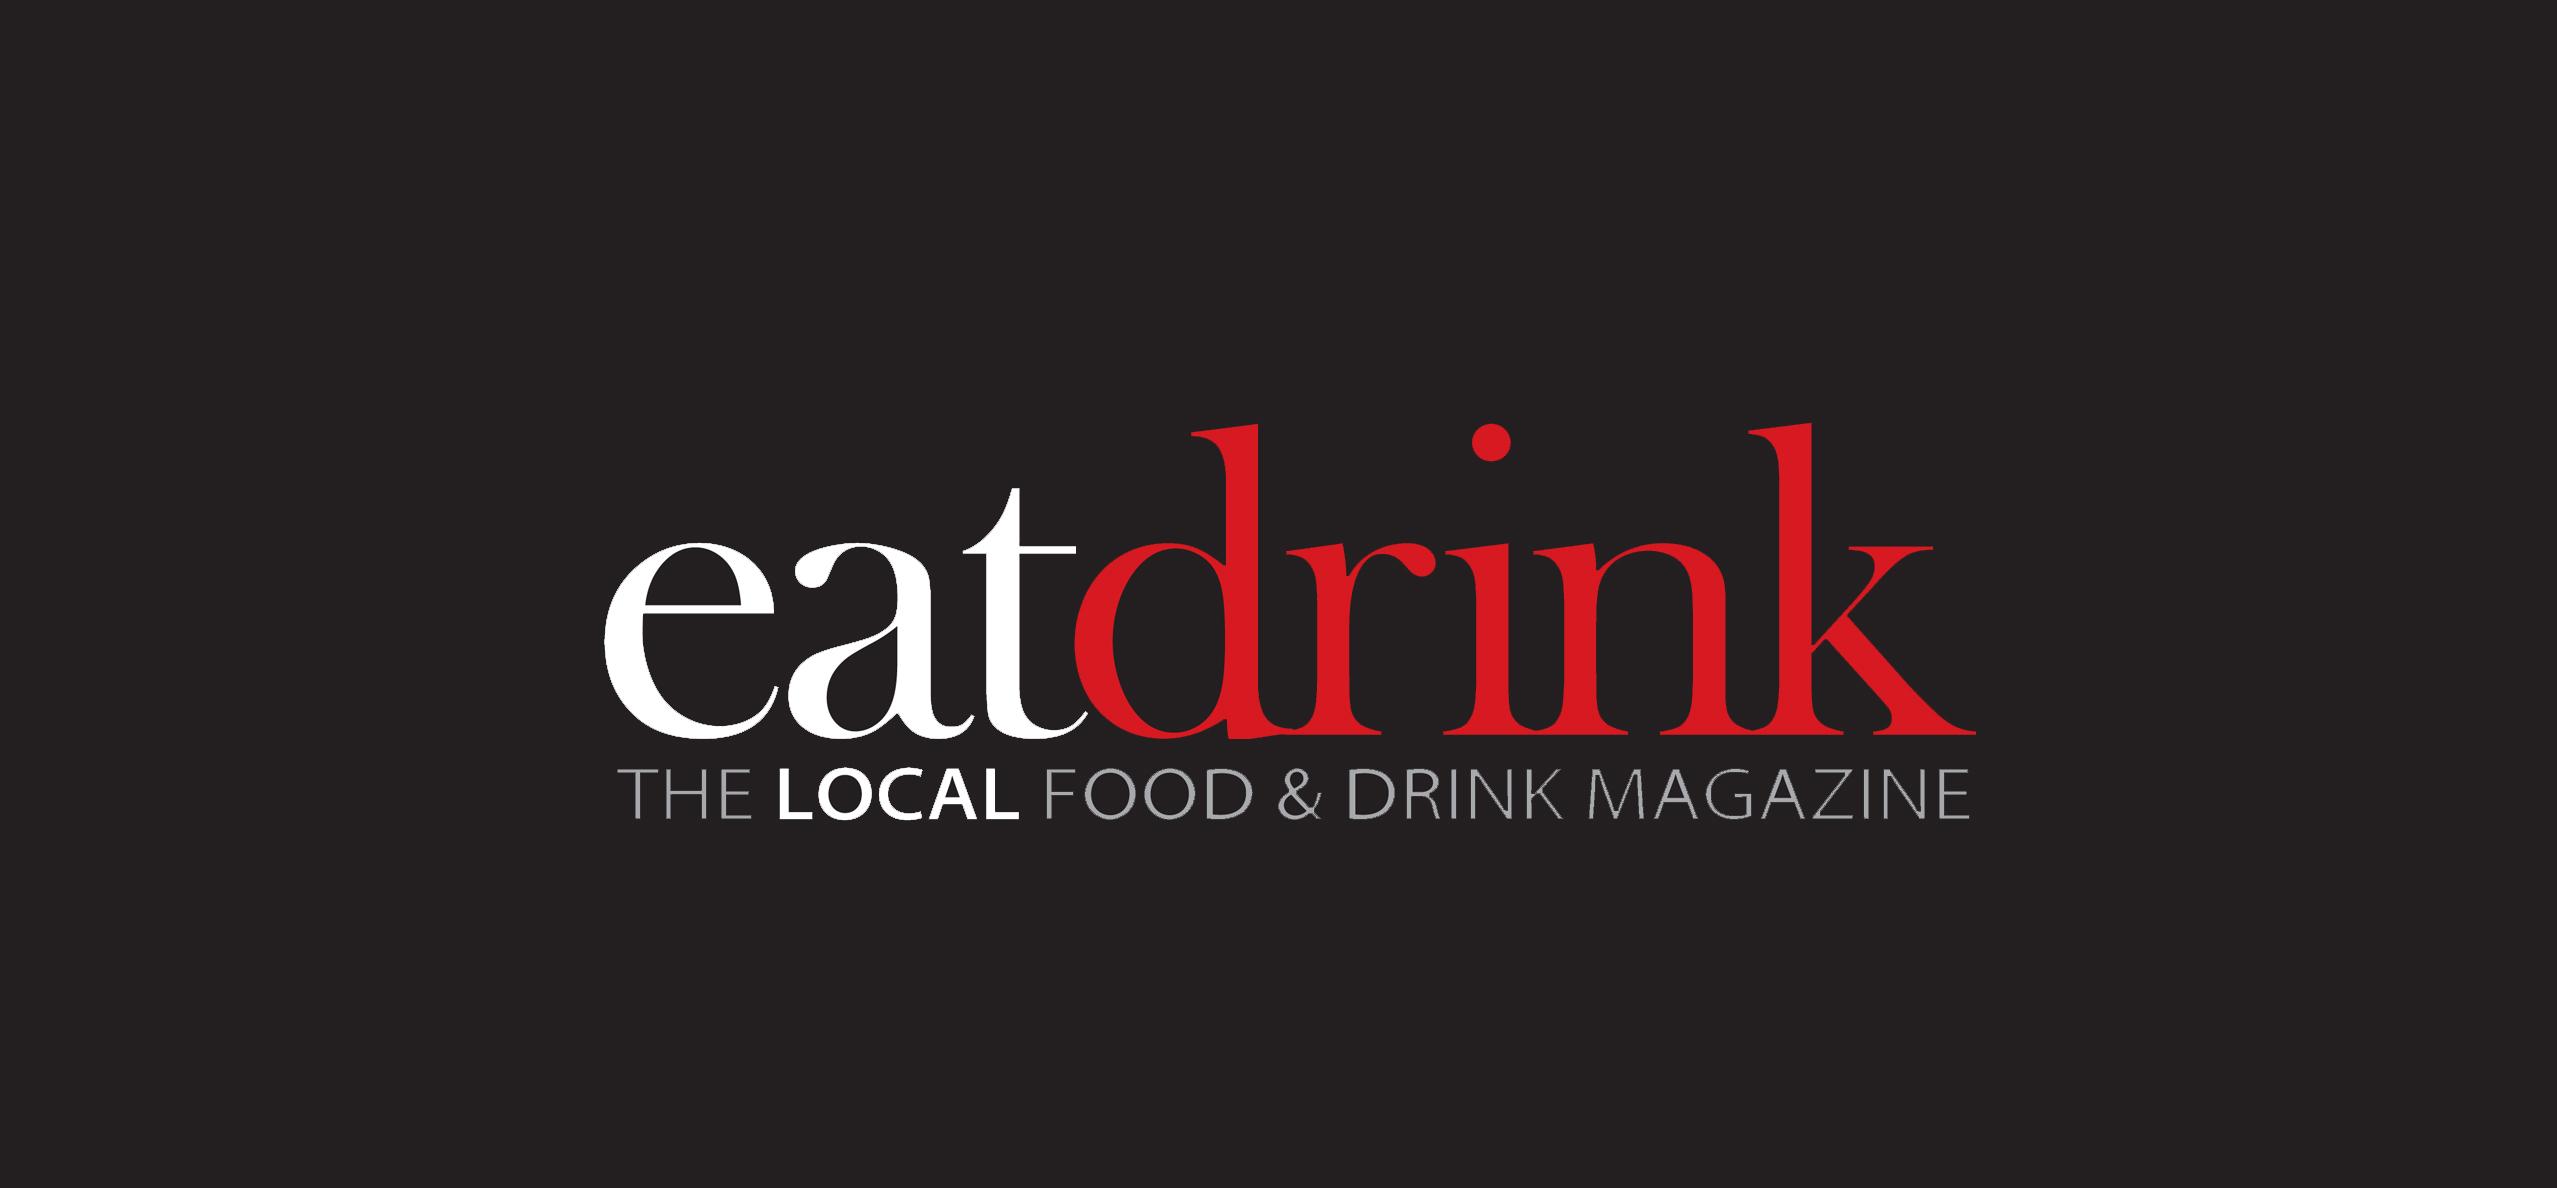 eatdrink.ca logo